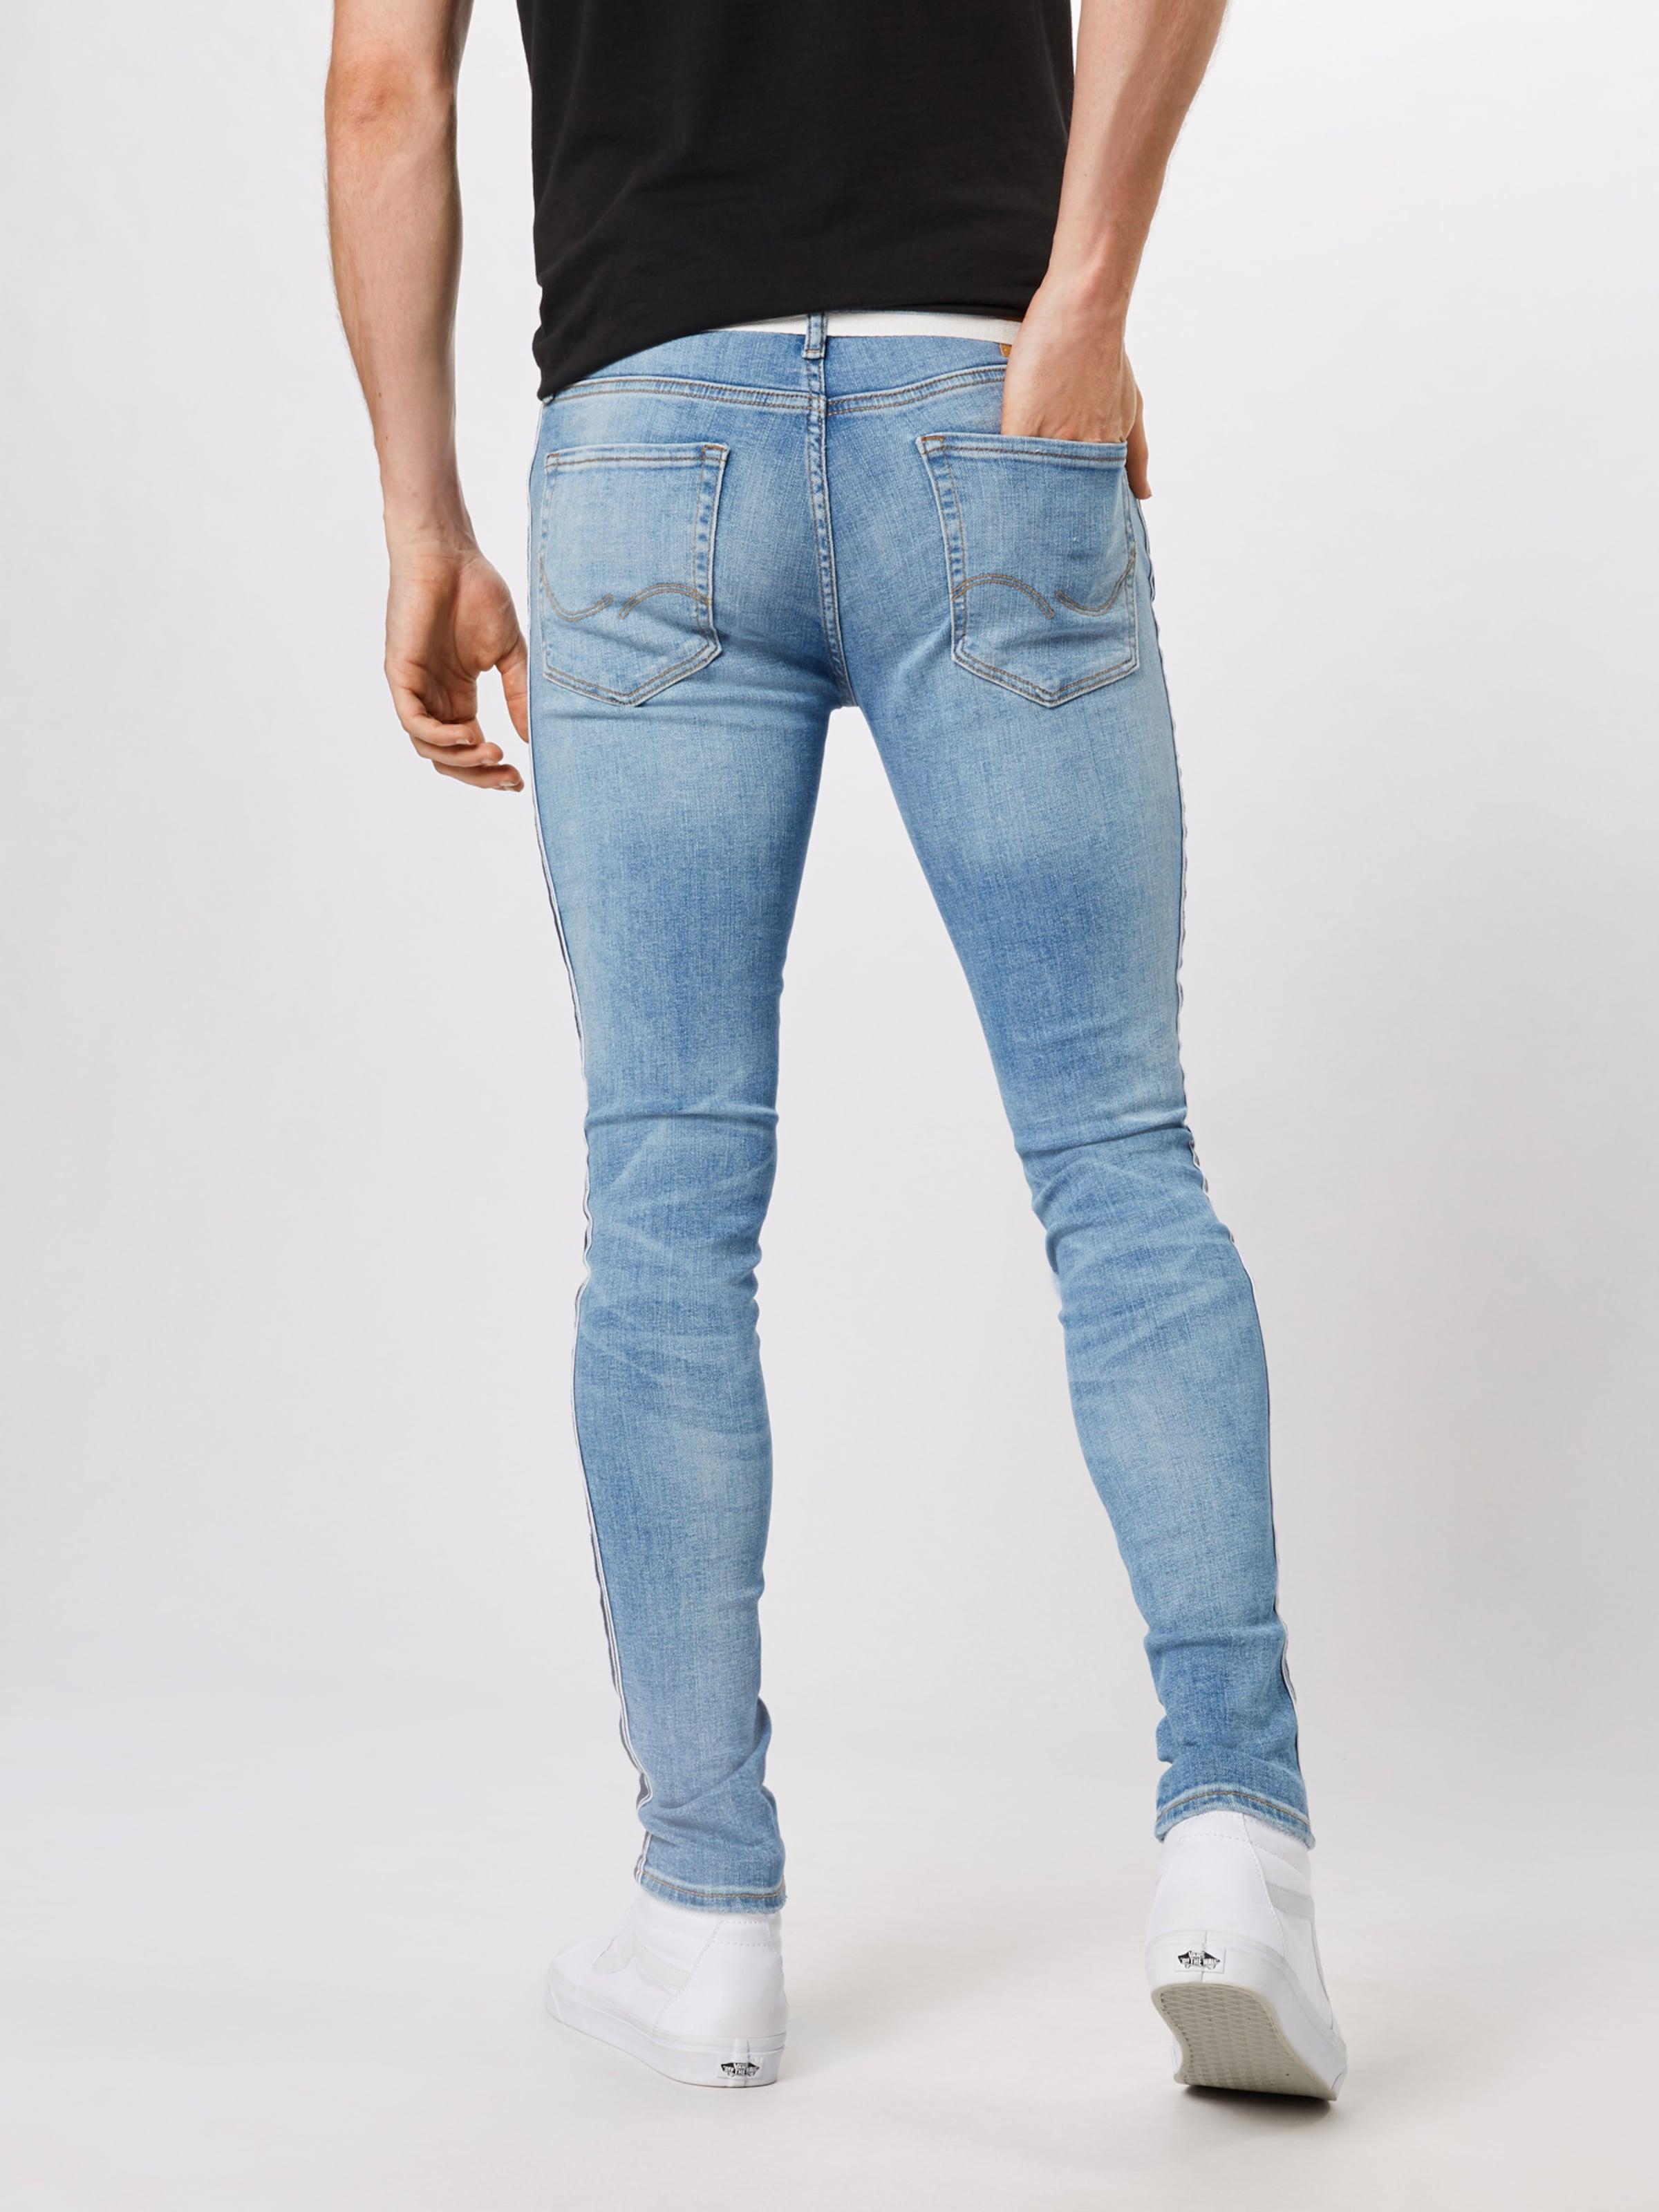 Jackamp; Blue Denim In Jones Jeans A3qc54RjL